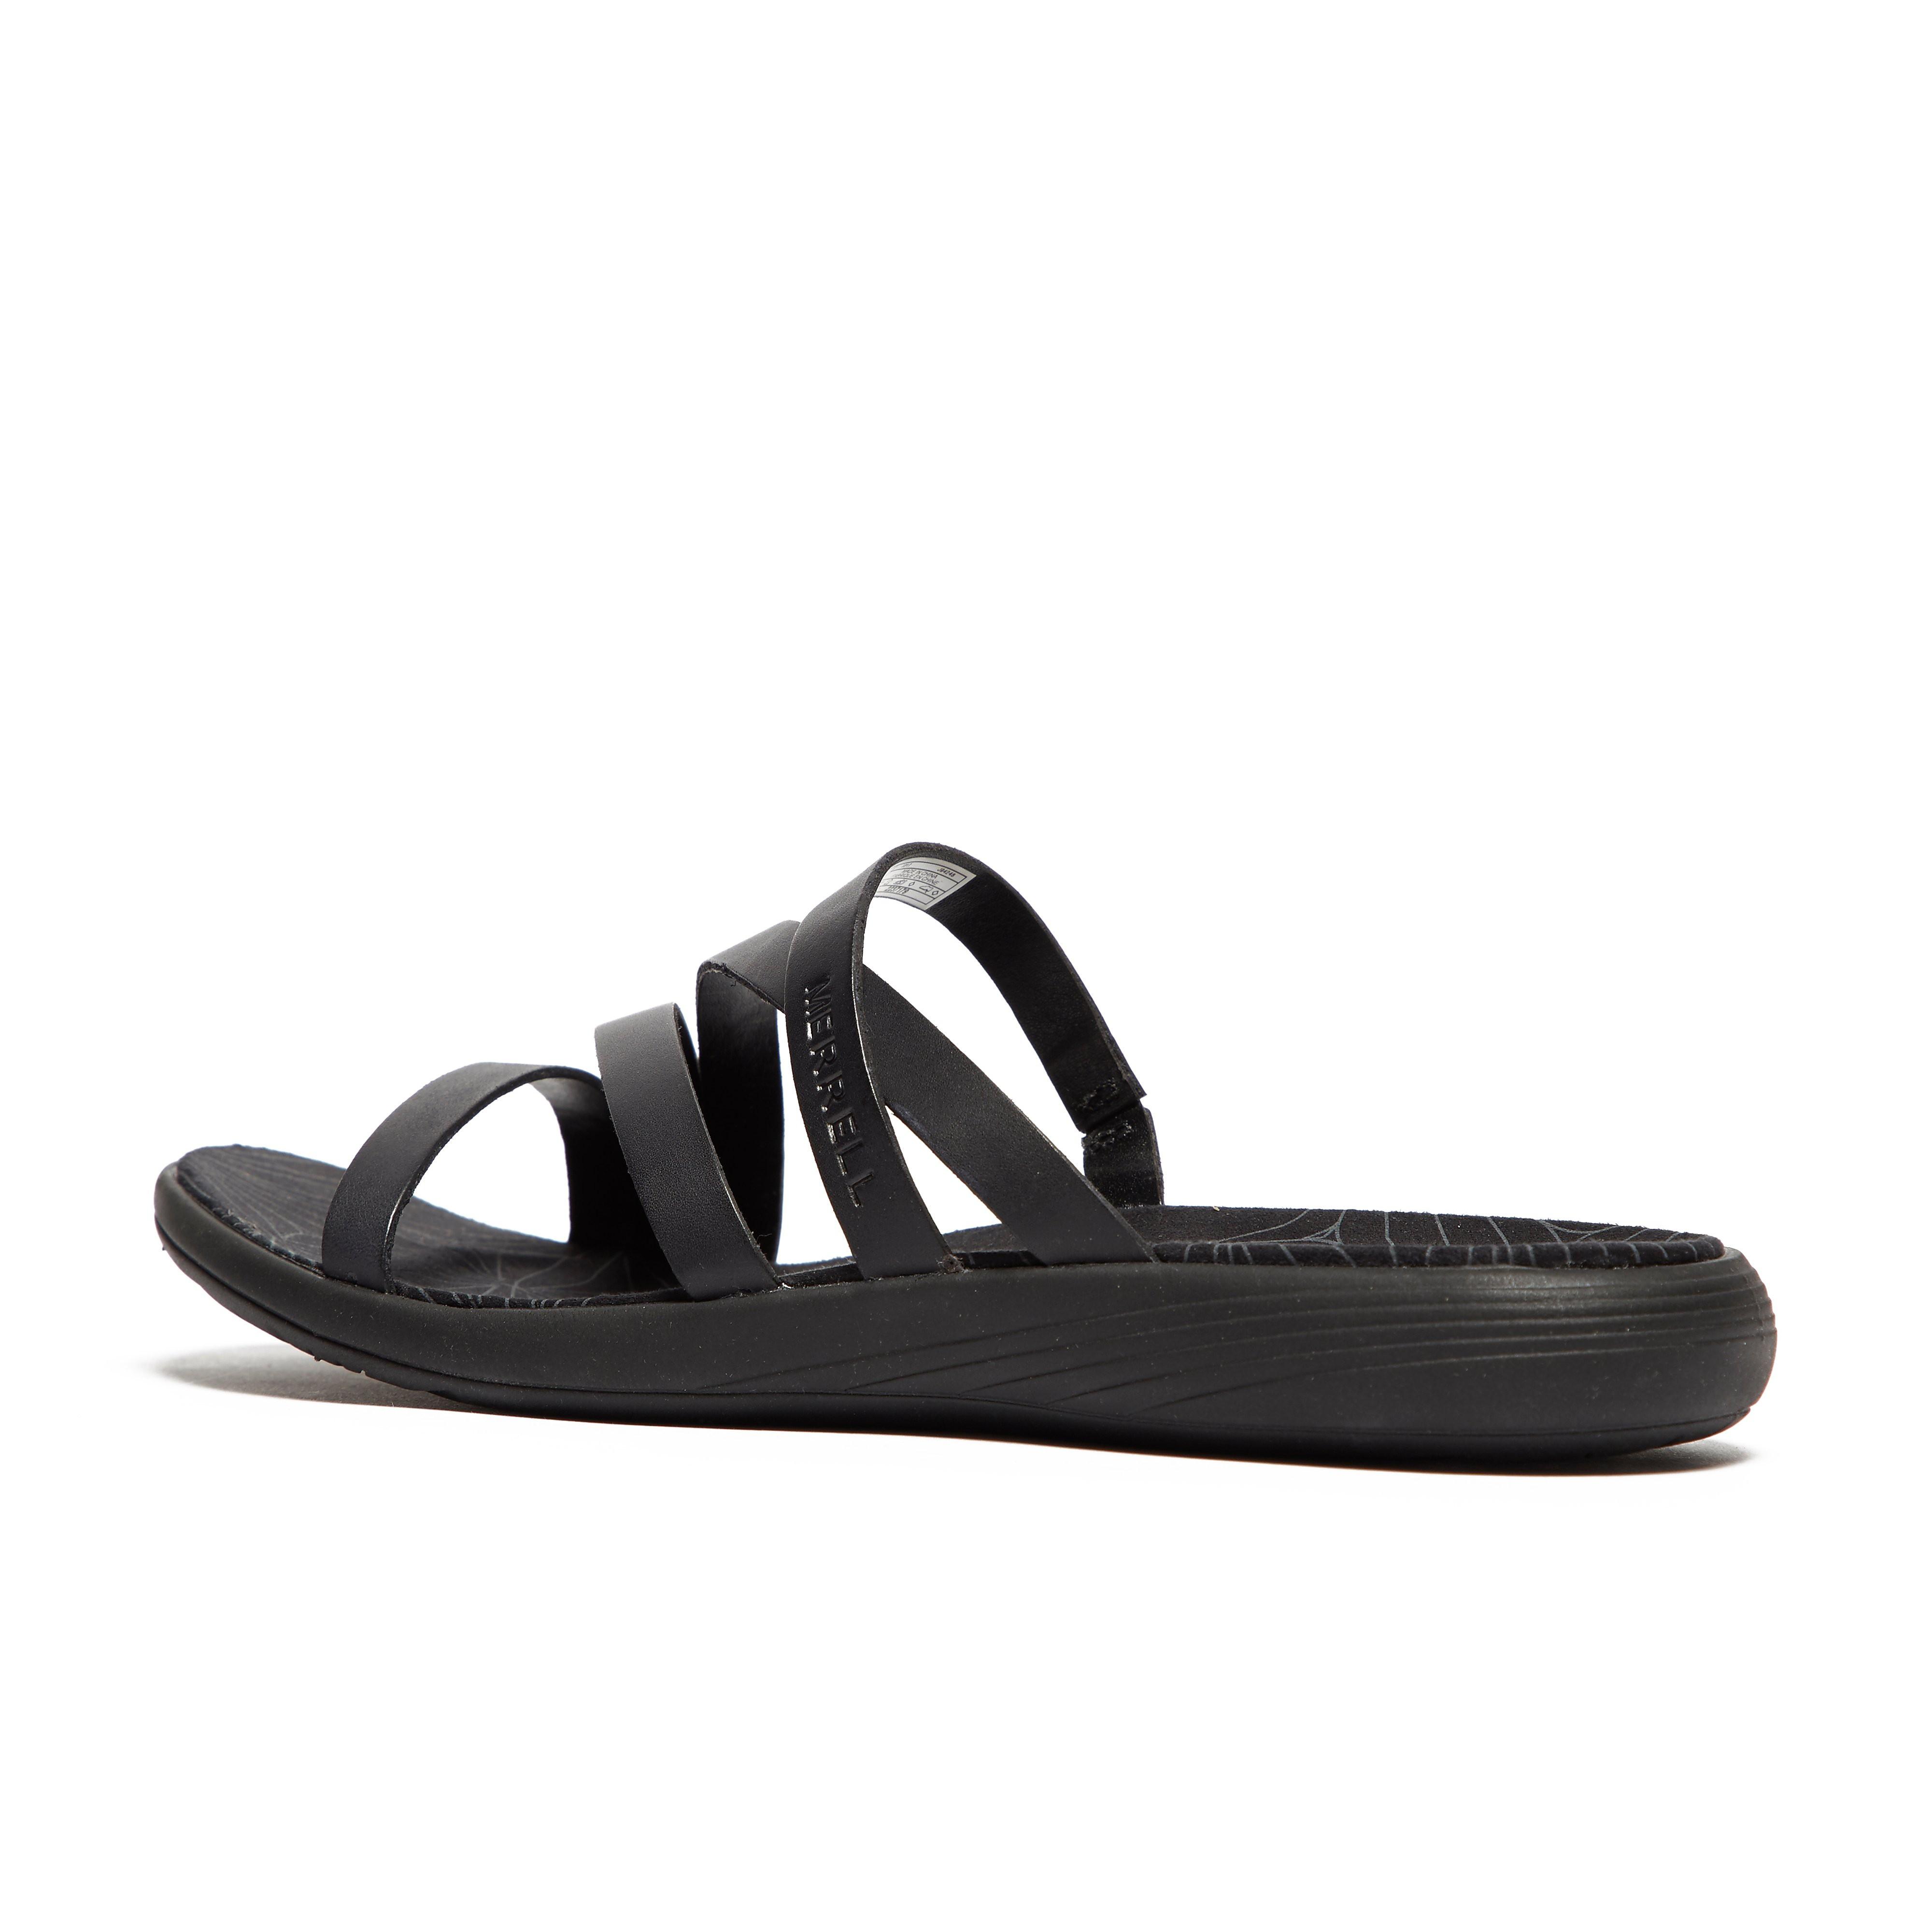 Merrell Duskair Seaway Leather Slide Women's Walking Sandal